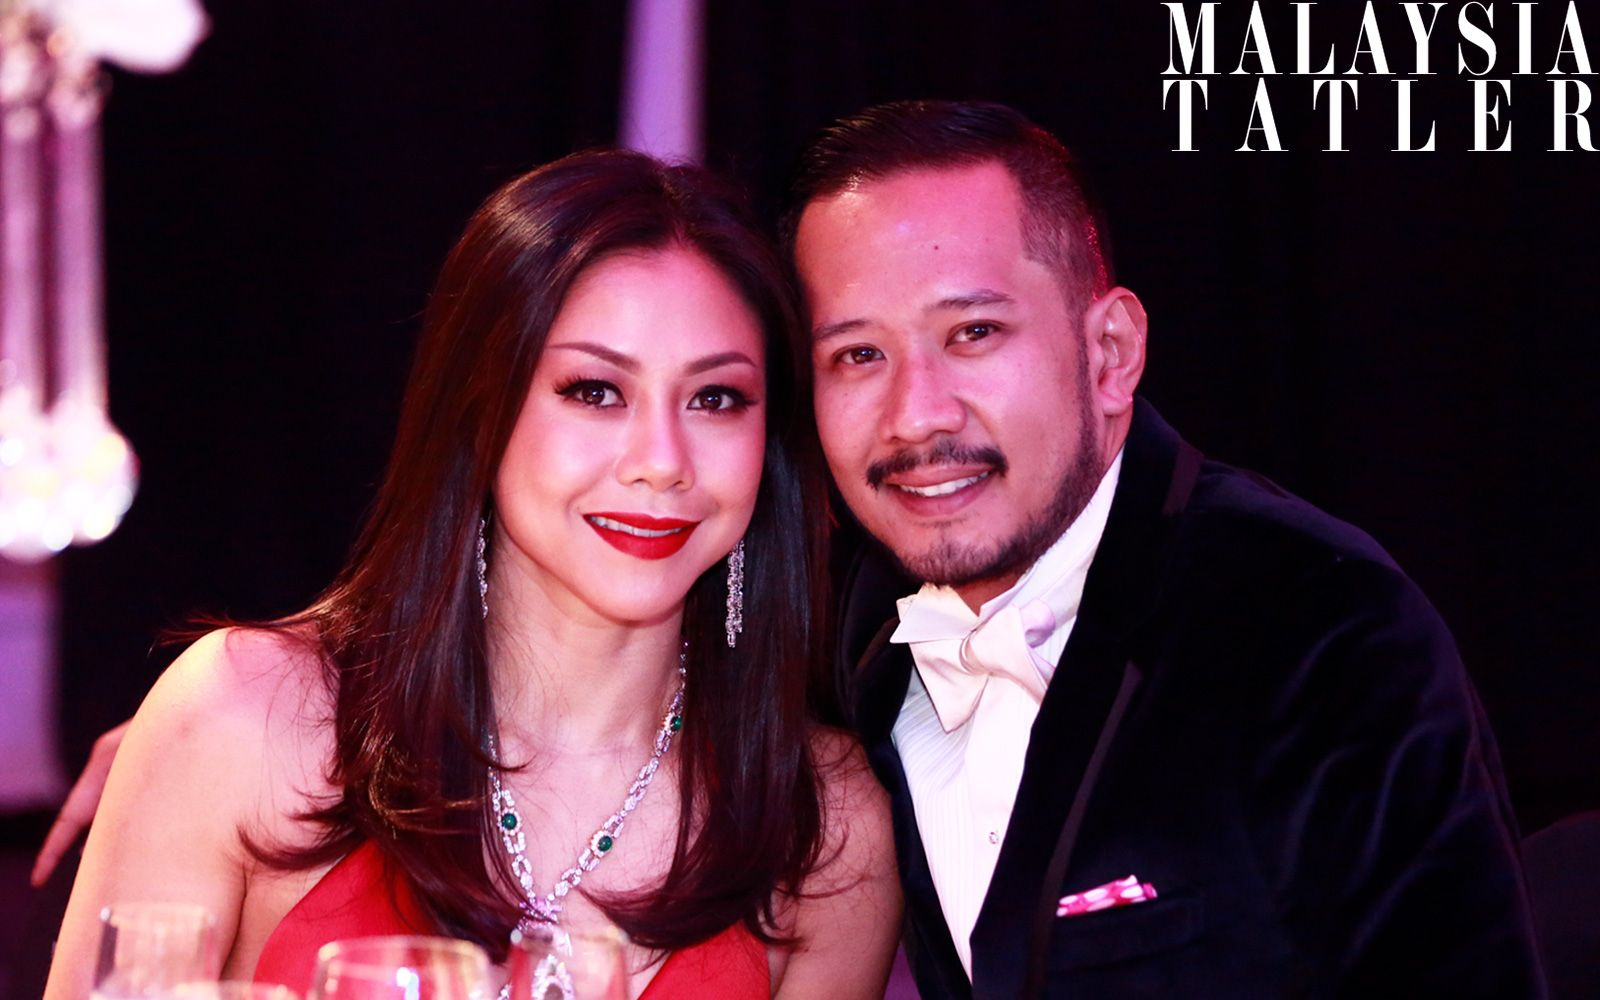 Datin Sabrena Khalid and Datuk Wira Dani